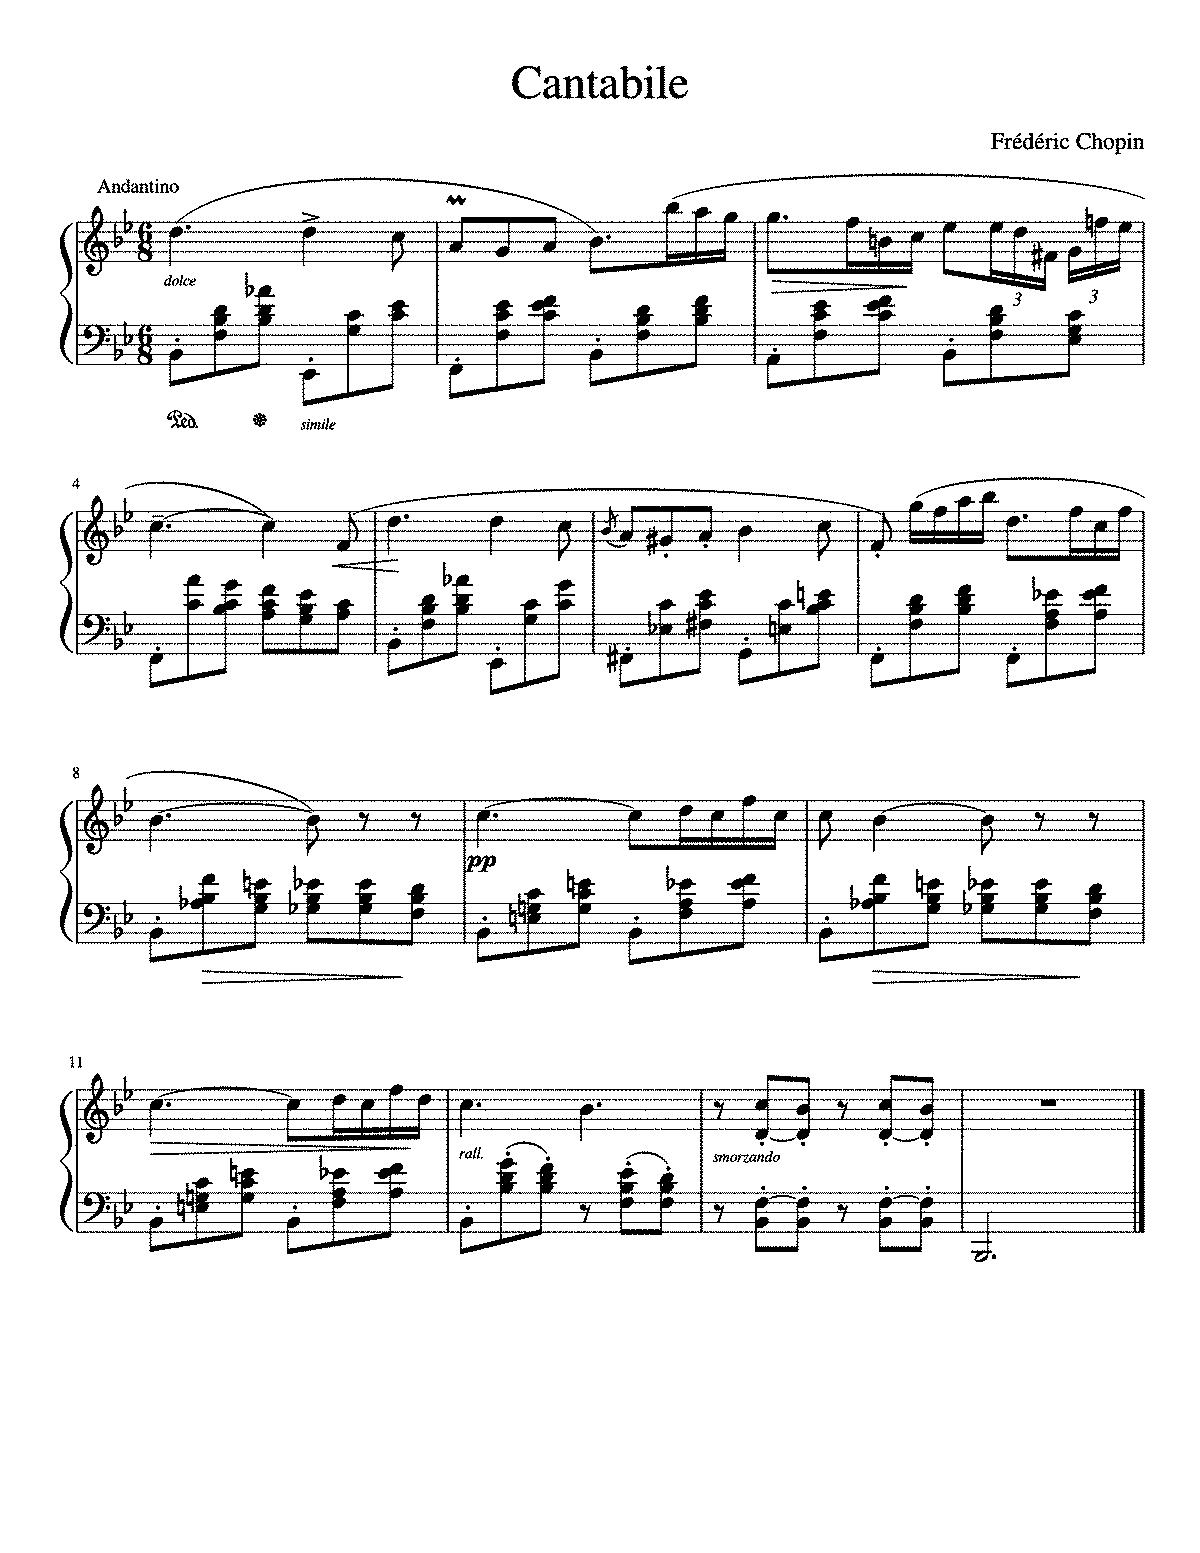 nocturne in d flat major chopin pdf